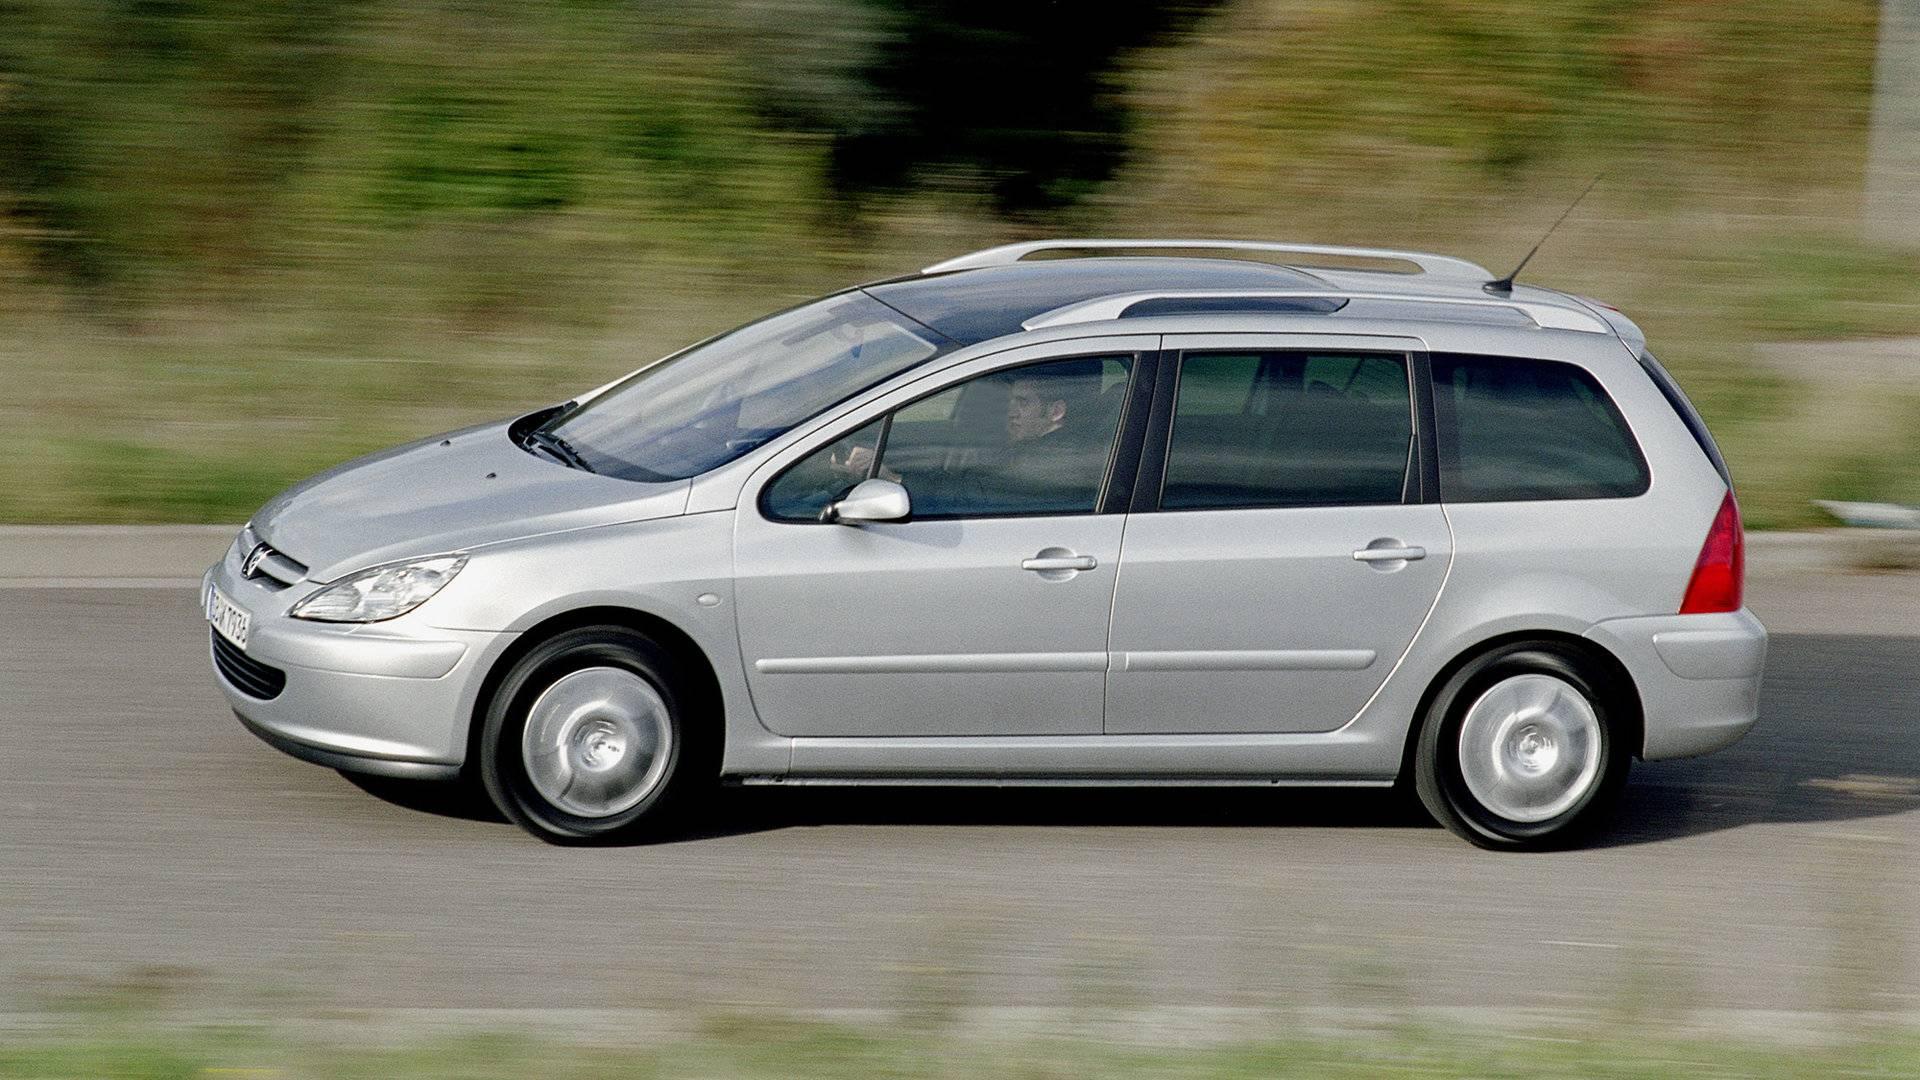 Coche del día: Peugeot 307 SW